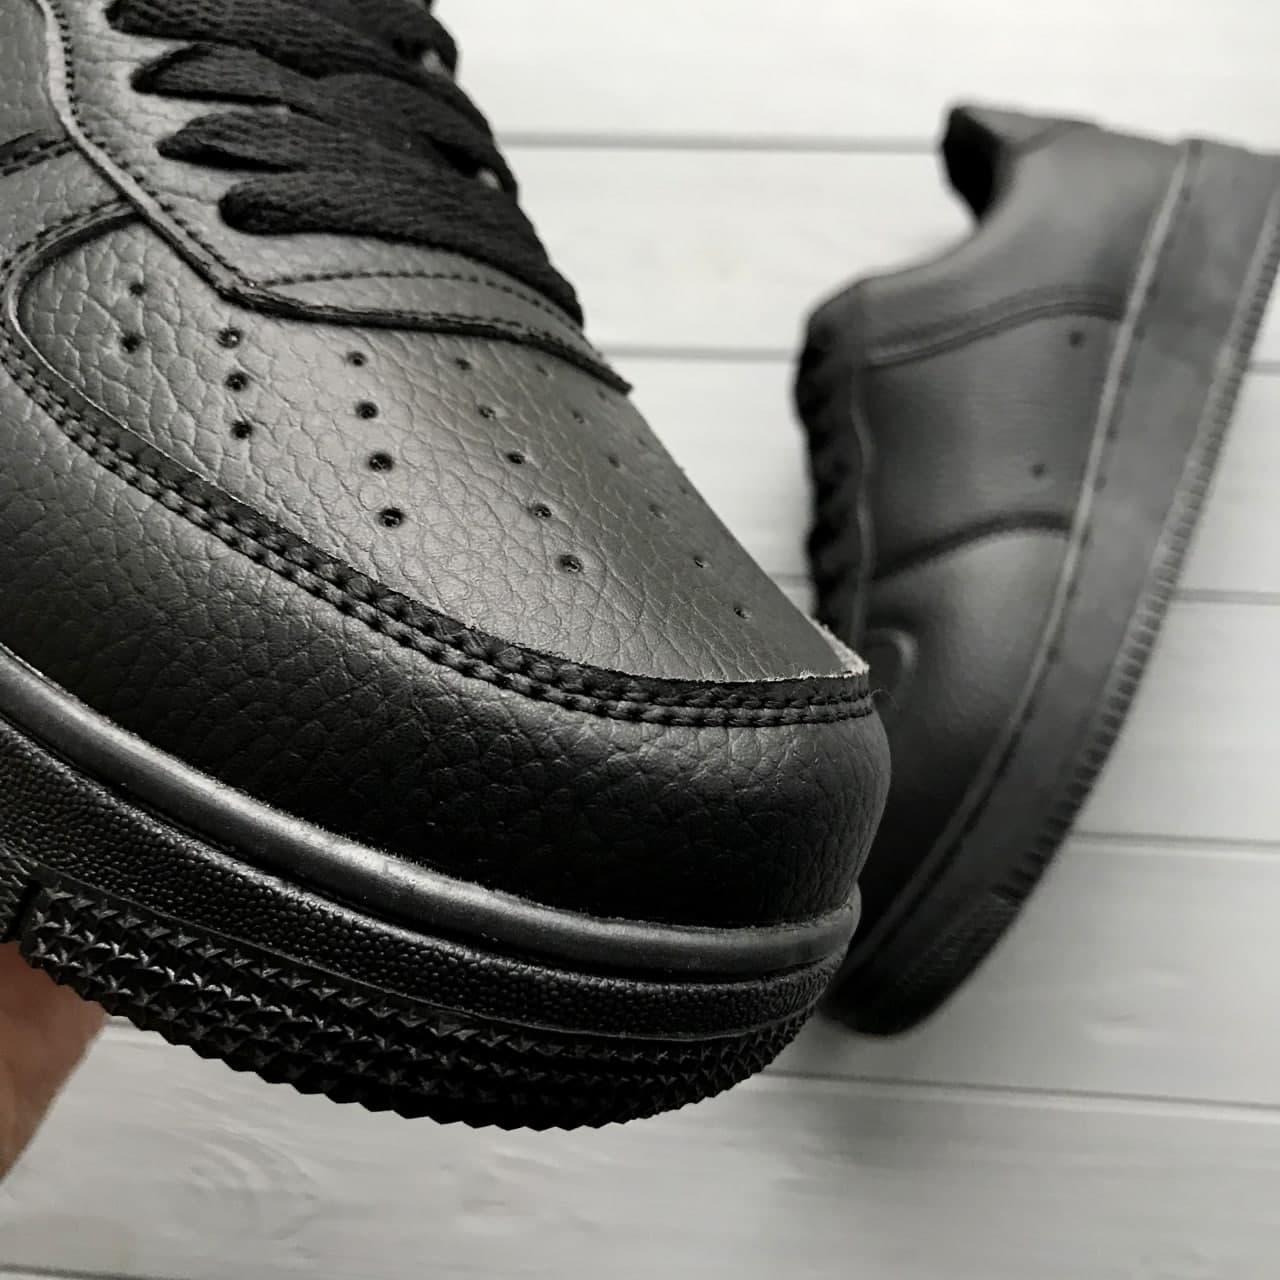 Мужские кроссовки Black FRE 41,42,43,44,45,46